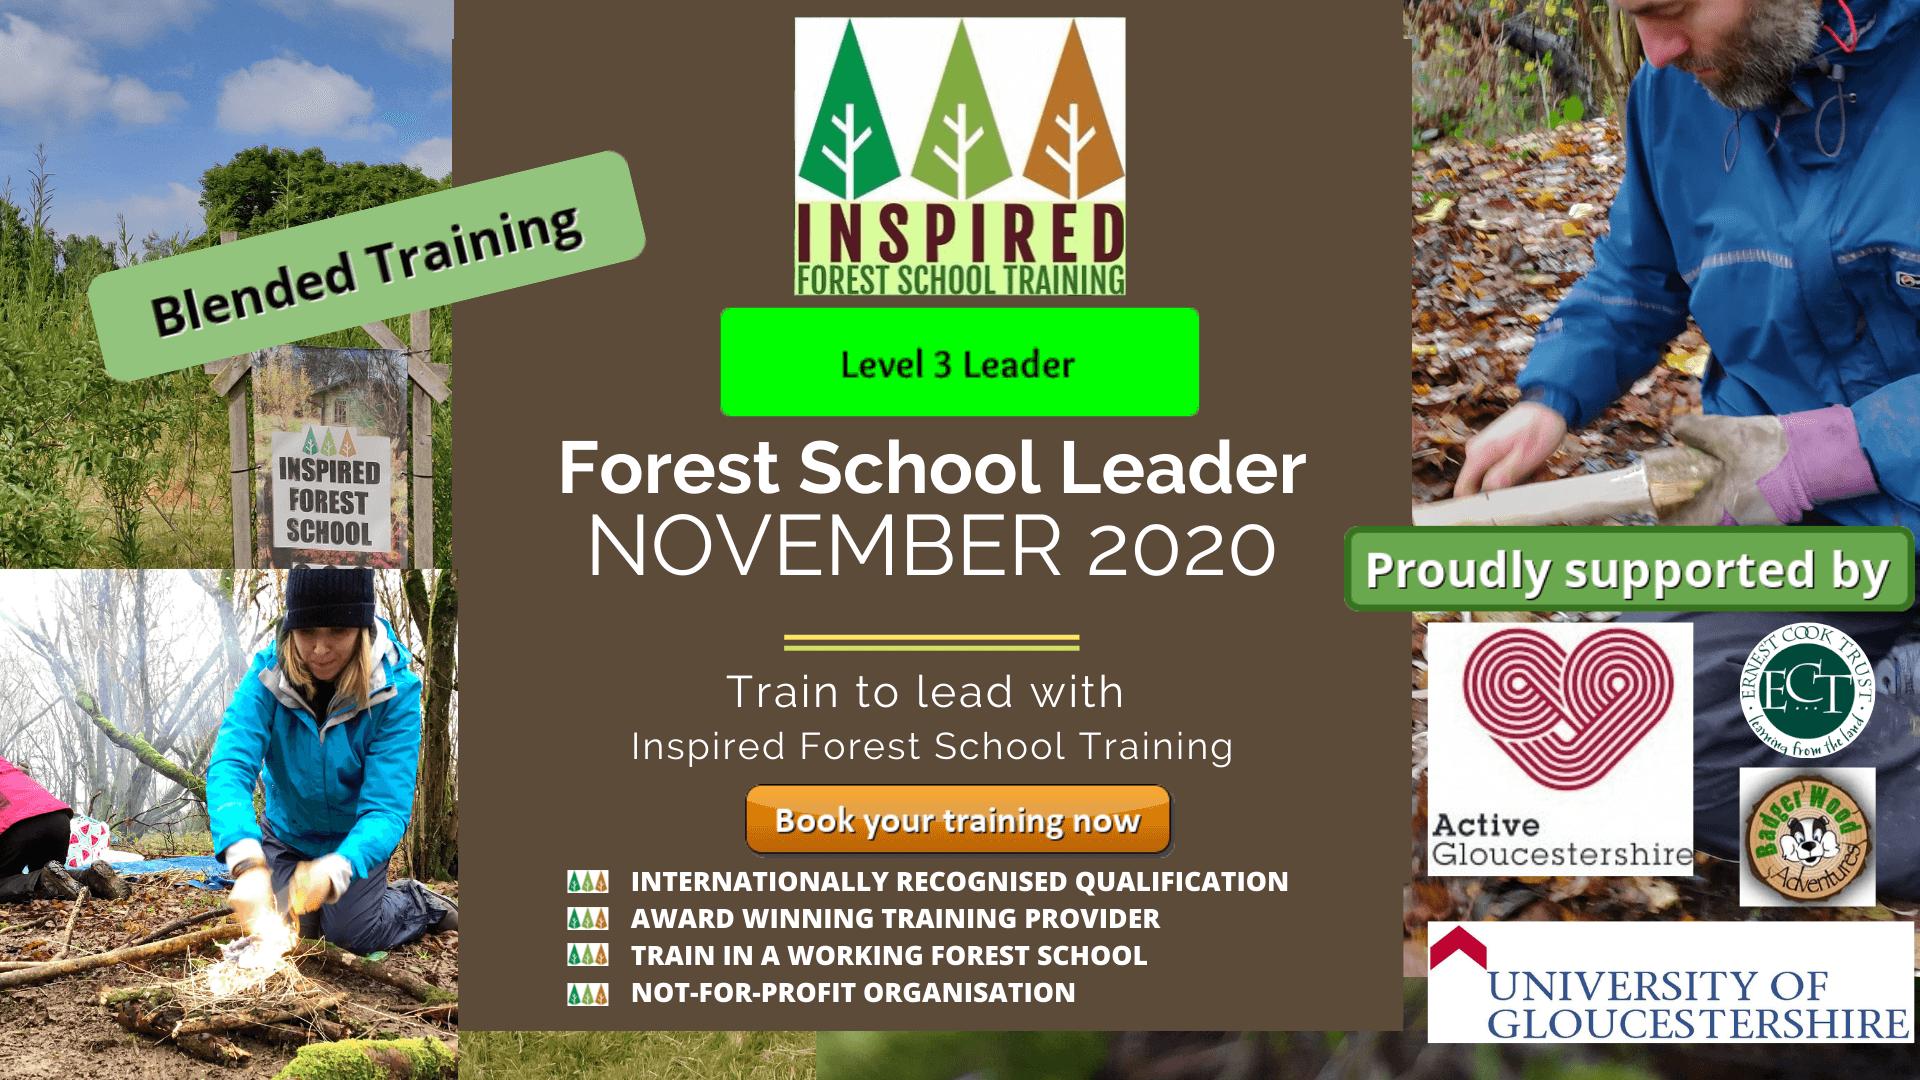 November-2021-Forest-School-Leader-training Forest School Leader Training - November 2021